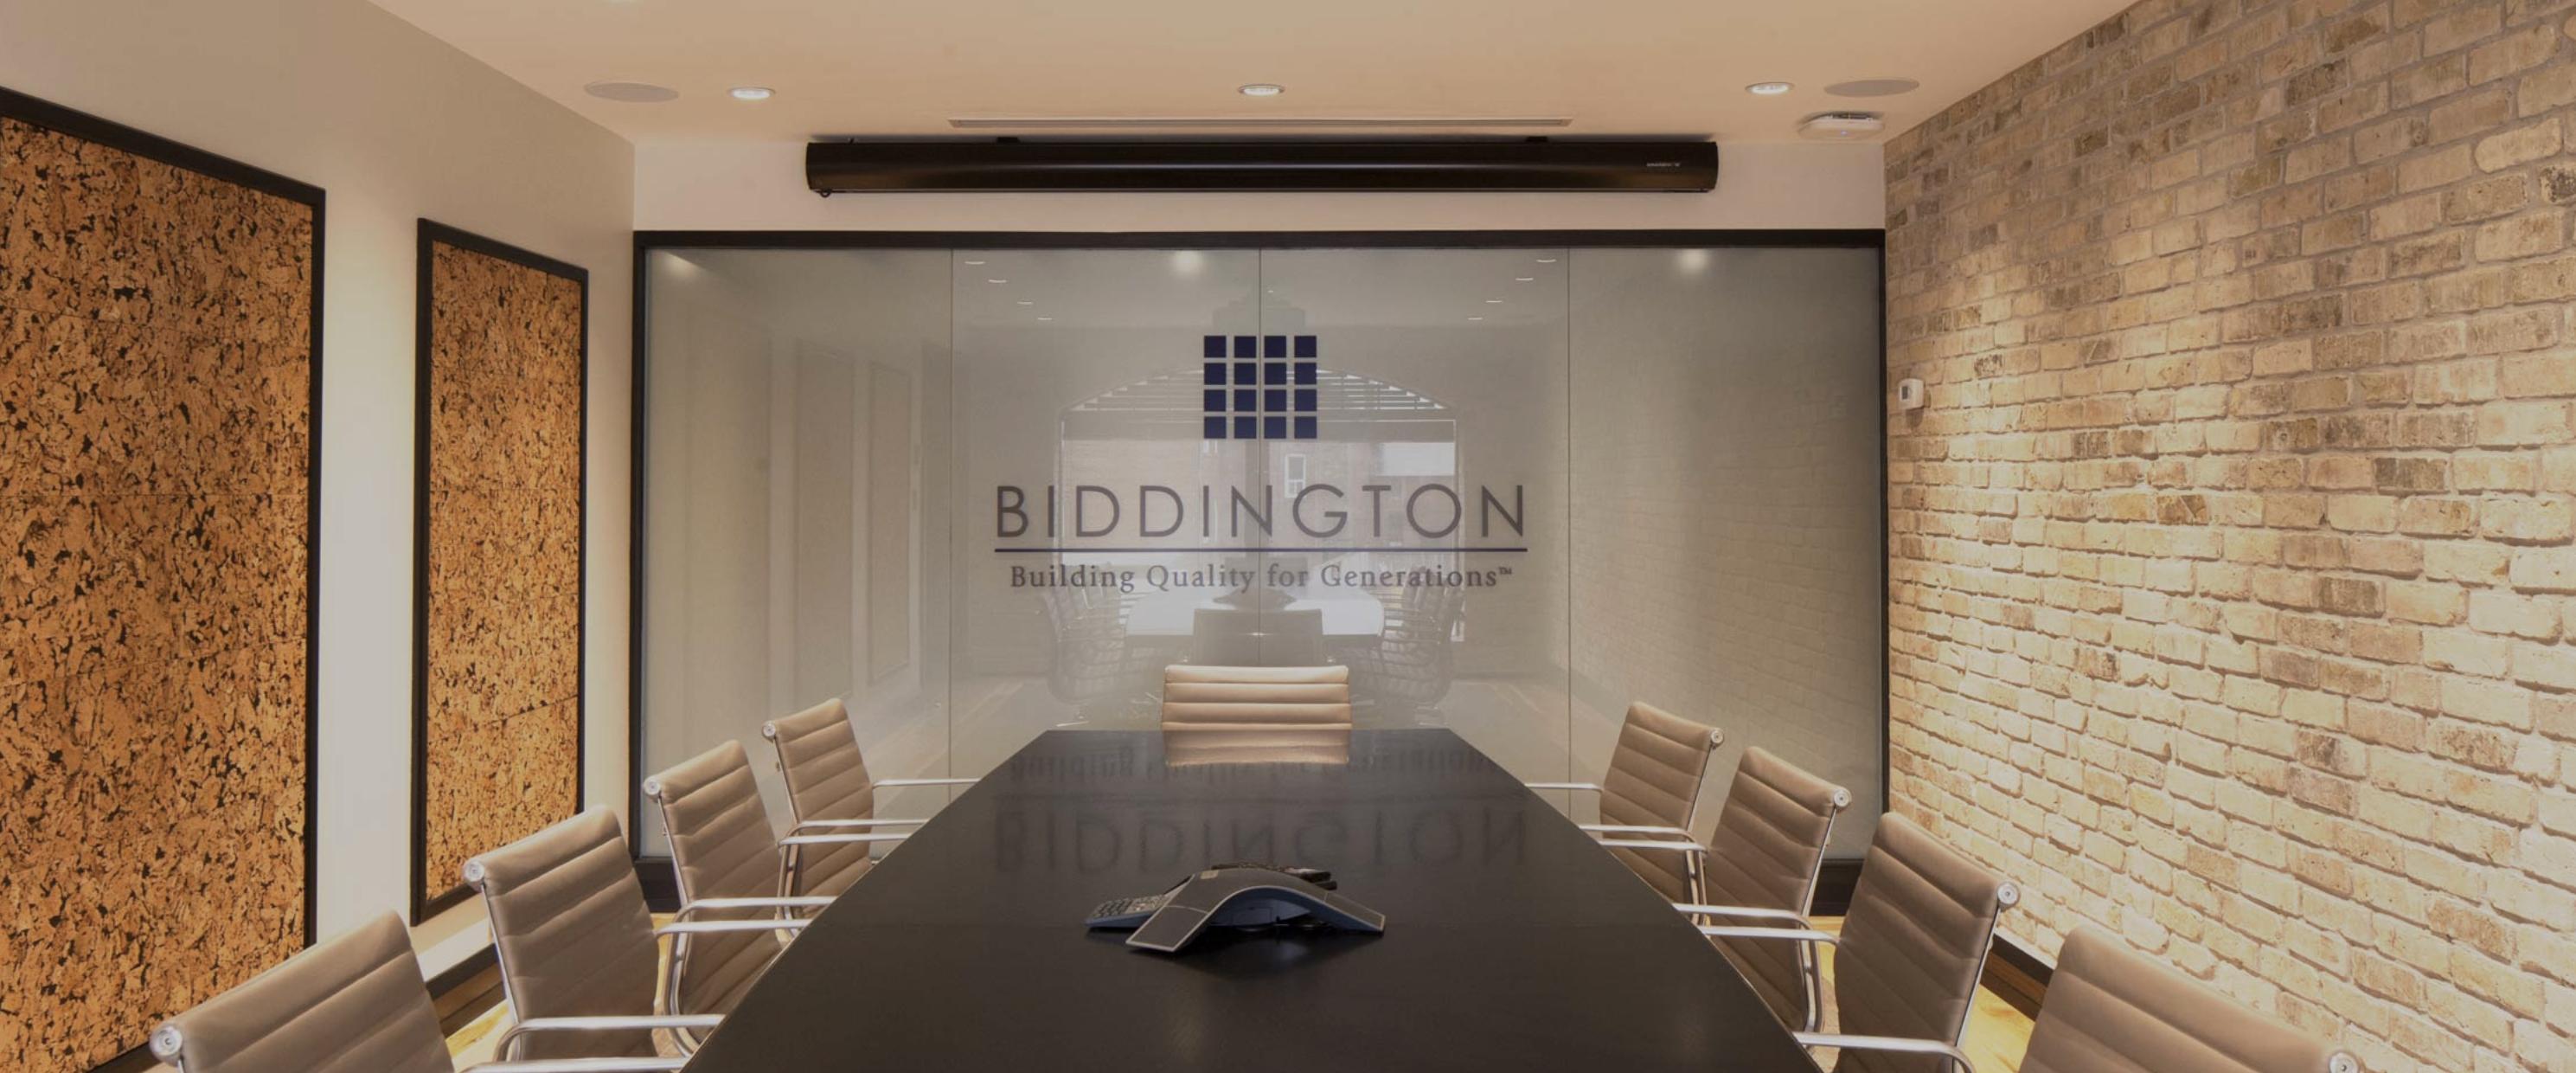 Biddington Group Office